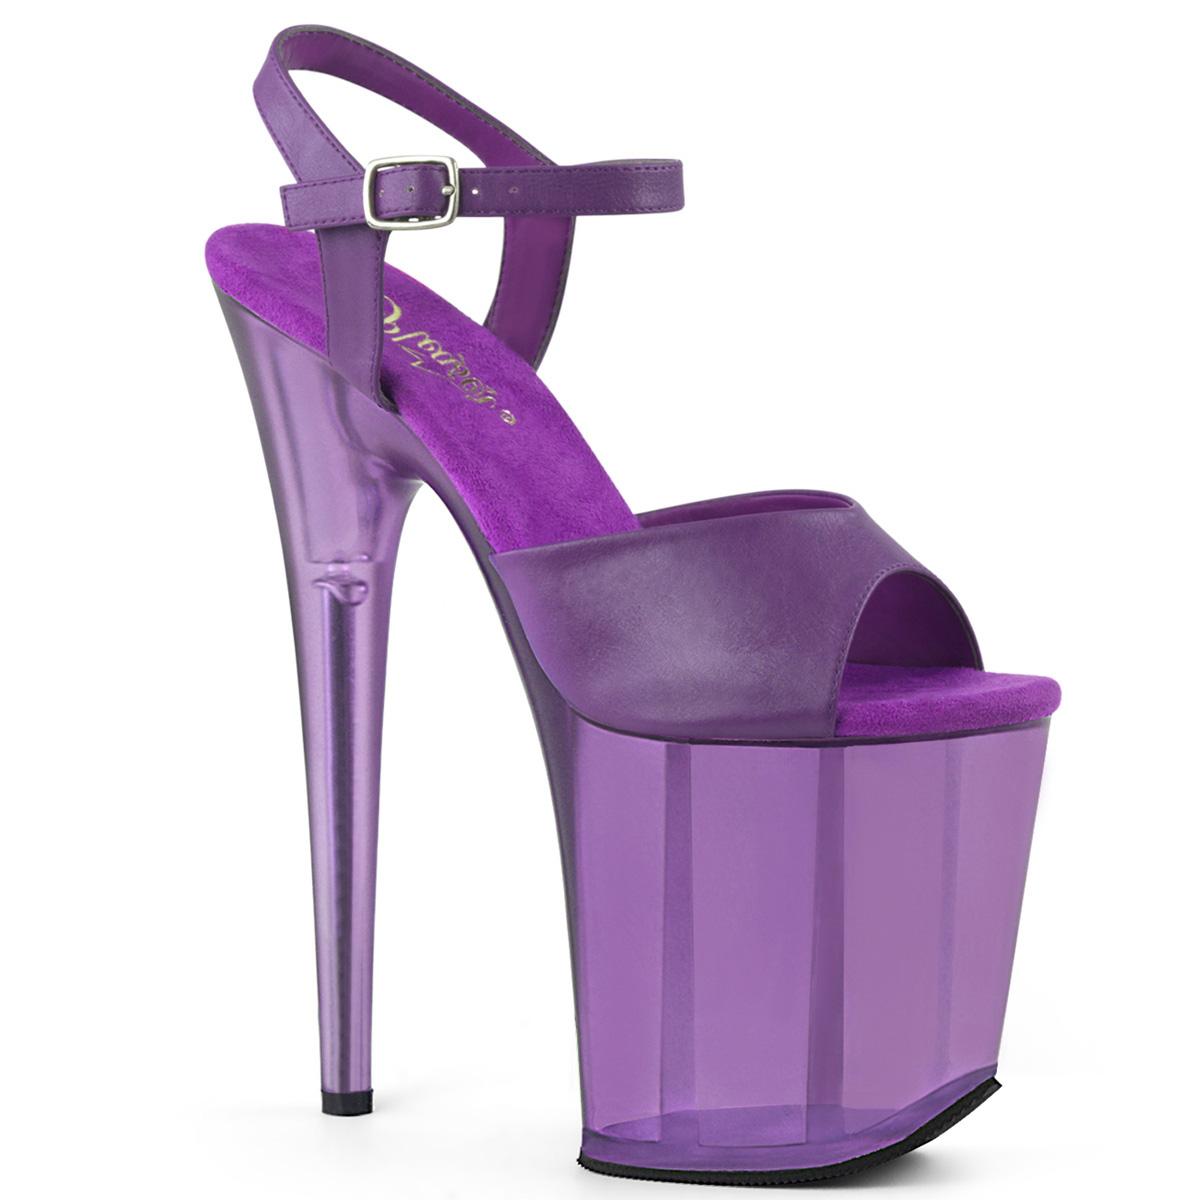 0008d38a766 Extreme Platform Heels FLAMINGO-809T - Purple